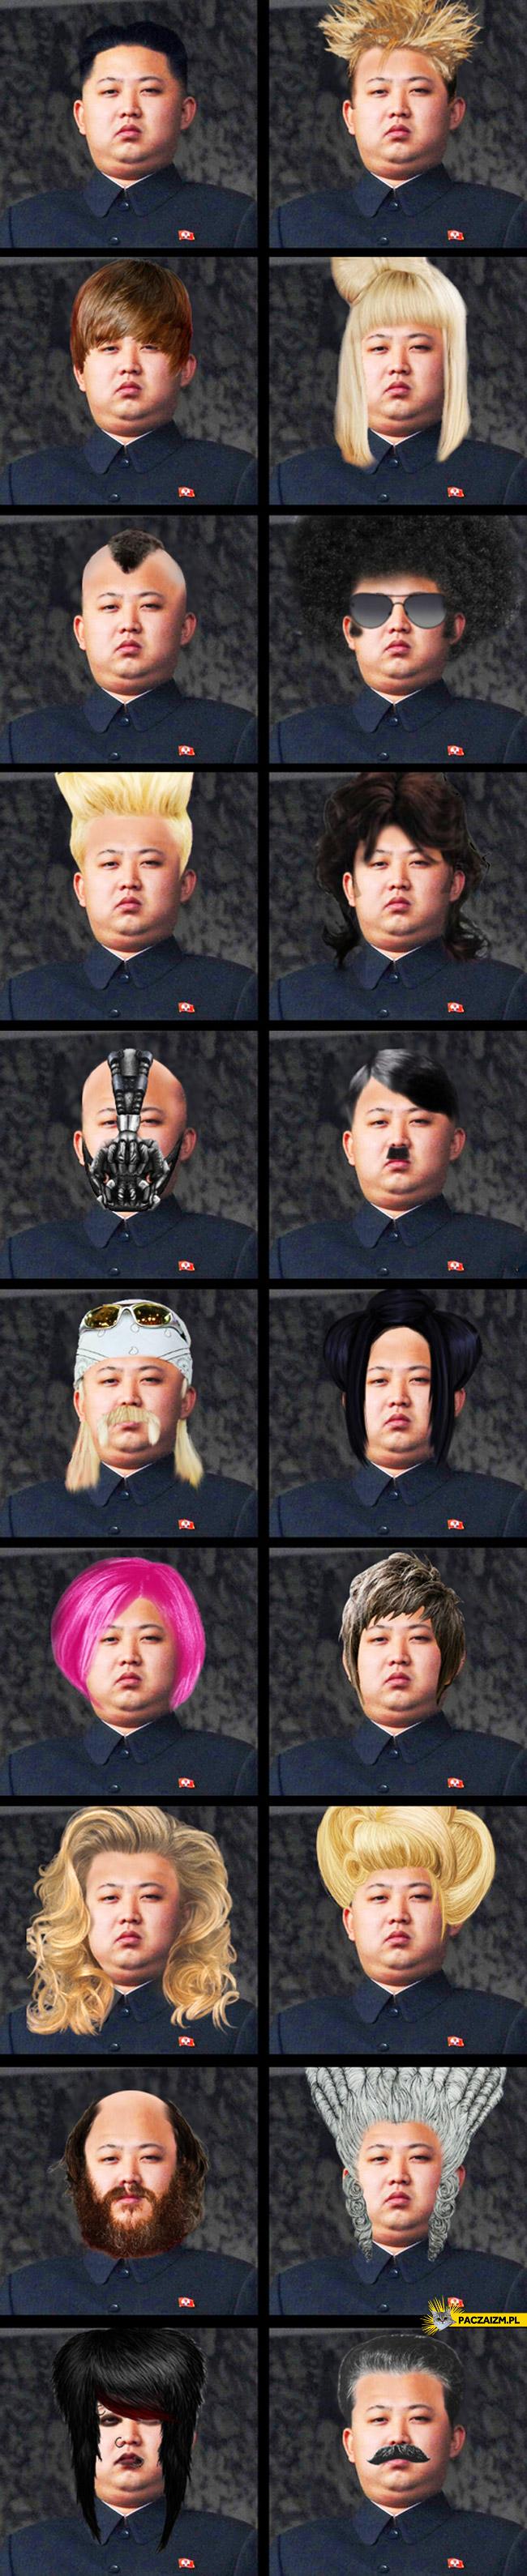 Kim Jong Un fryzury